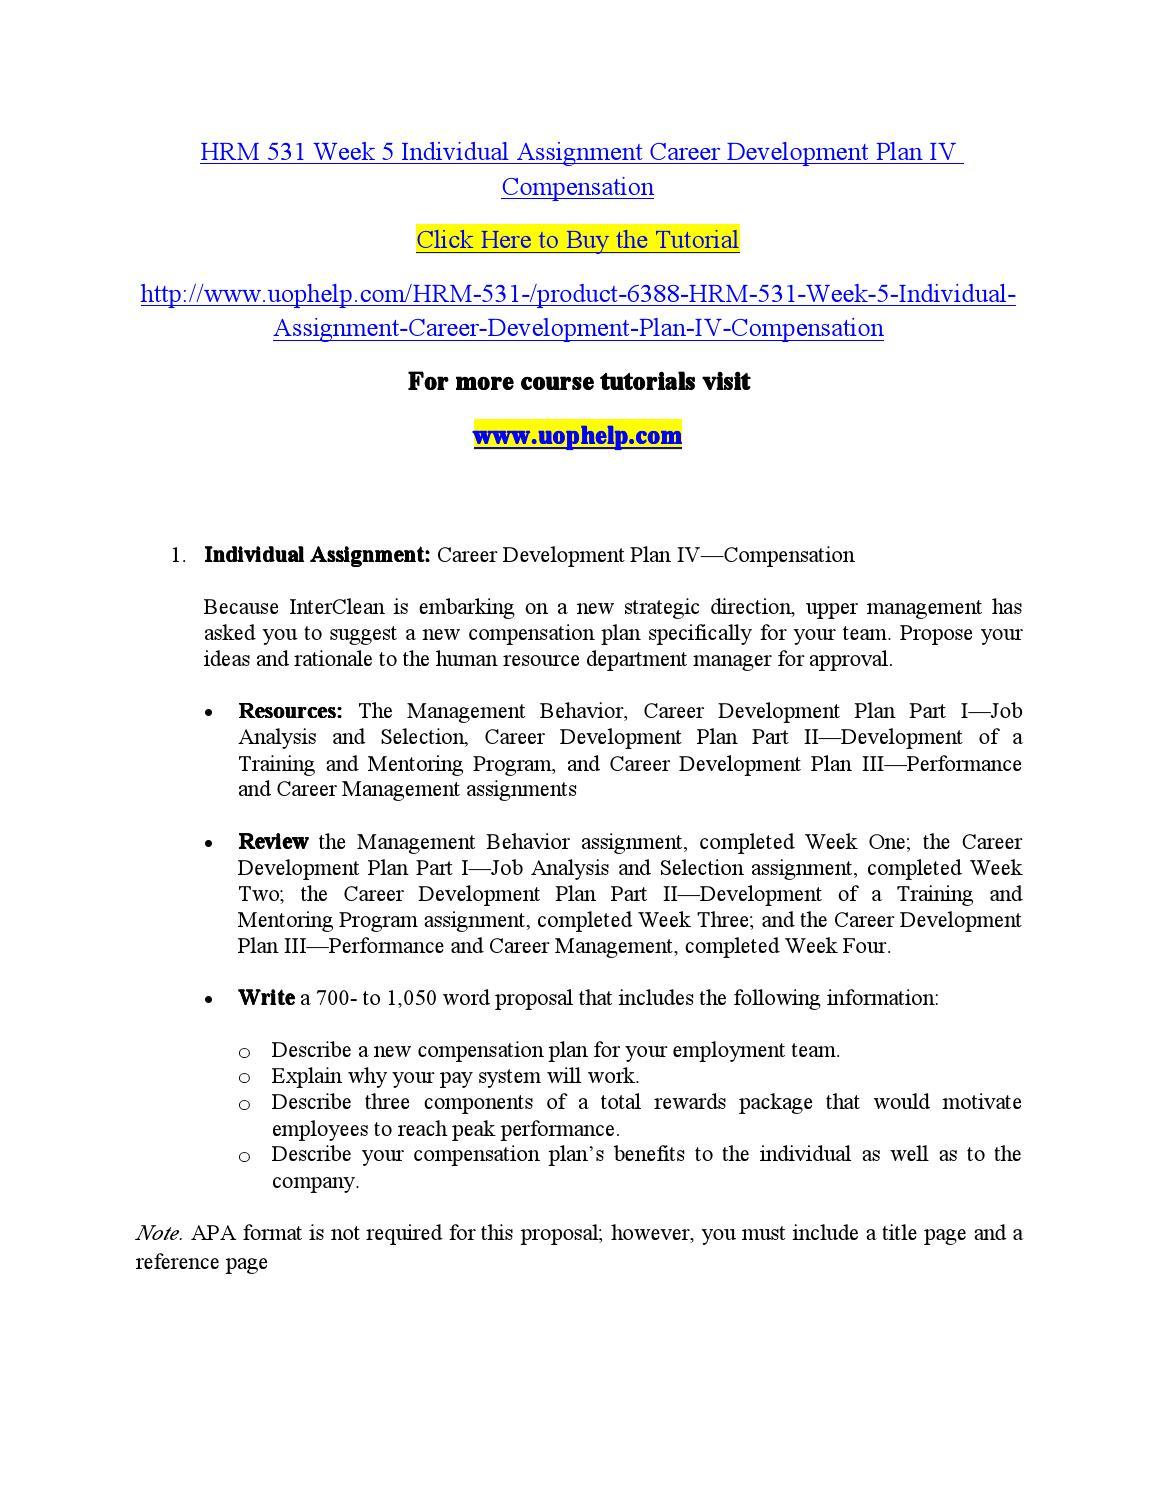 hrm 531 week 5 individual assignment career development plan iv